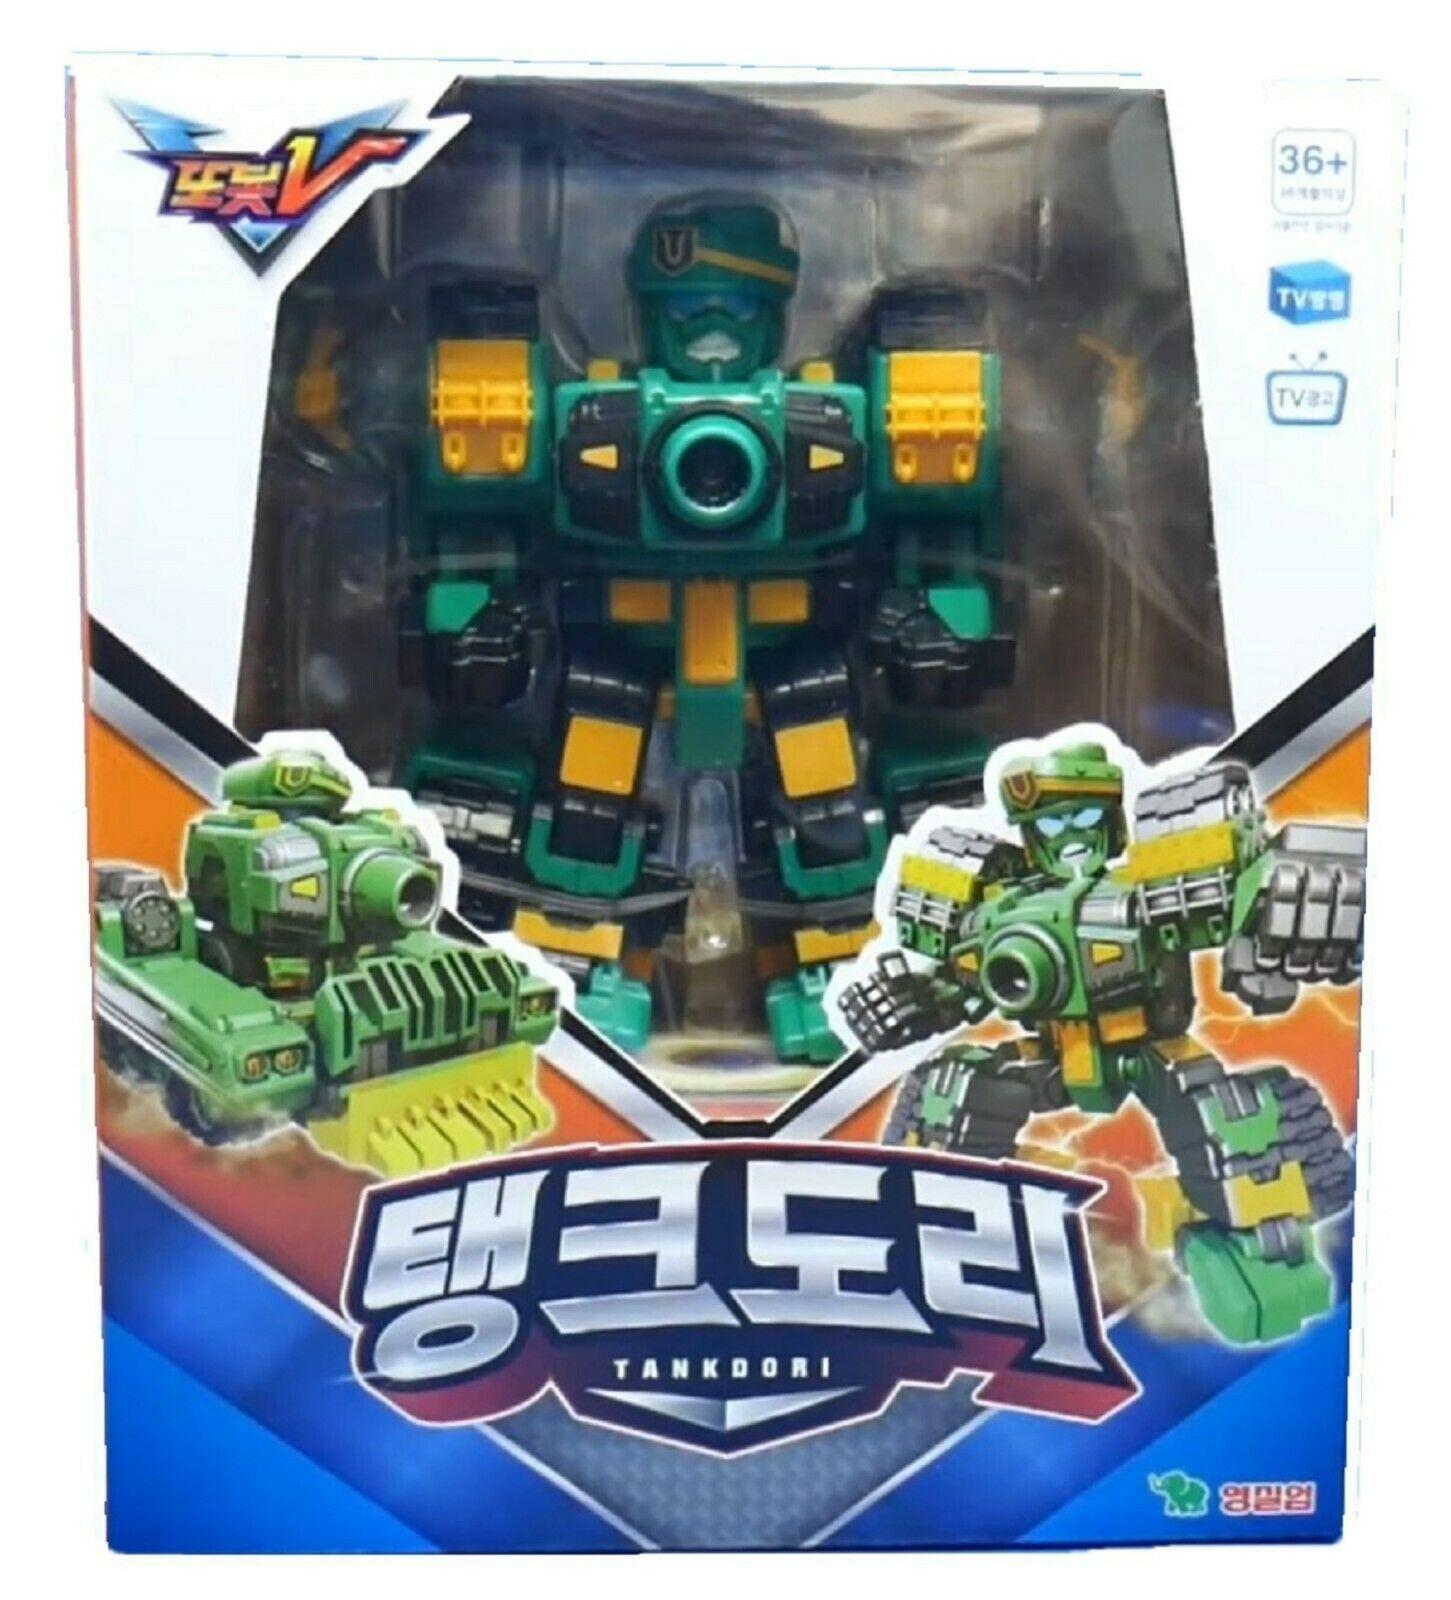 Tobot V Tankdori Transformation Action Figure Robot Vehicle Tank Toy